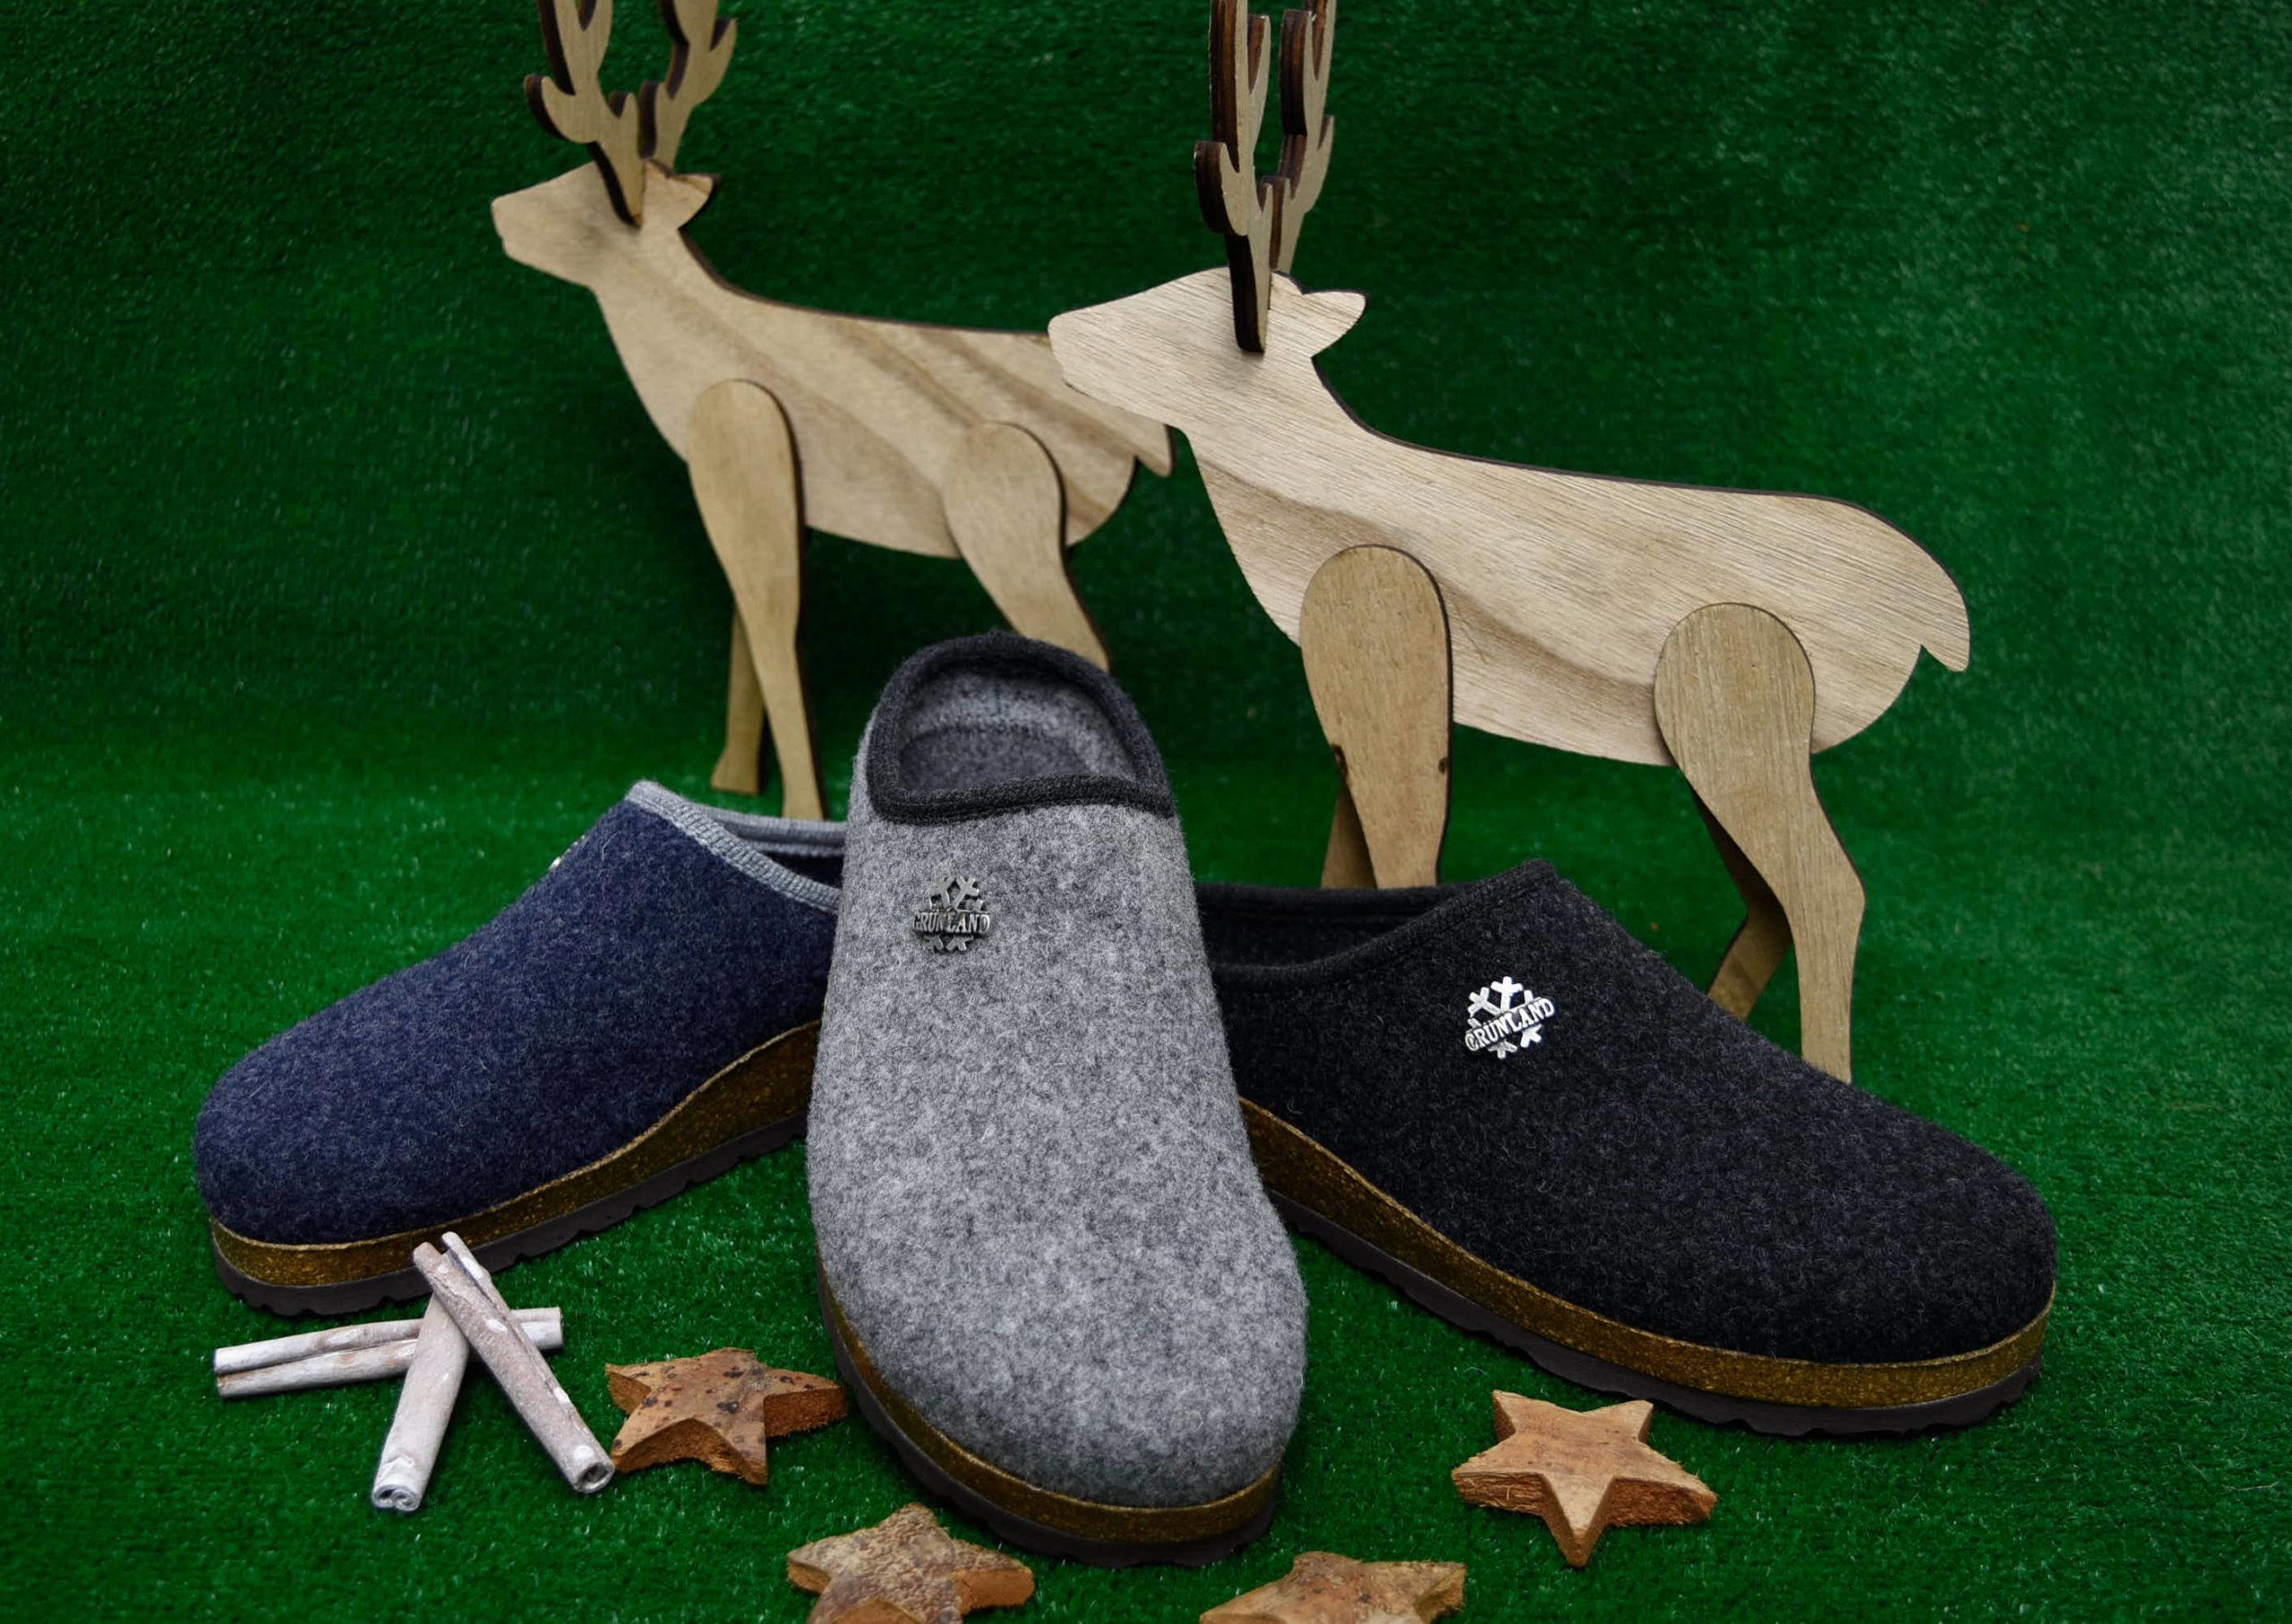 grunland robi cb0173 11 grigio antracite jeans ciabatte da uomo natalizie pantofole tirolesi calzature tradizionali altoatesine feltro lana cotta idea regalo